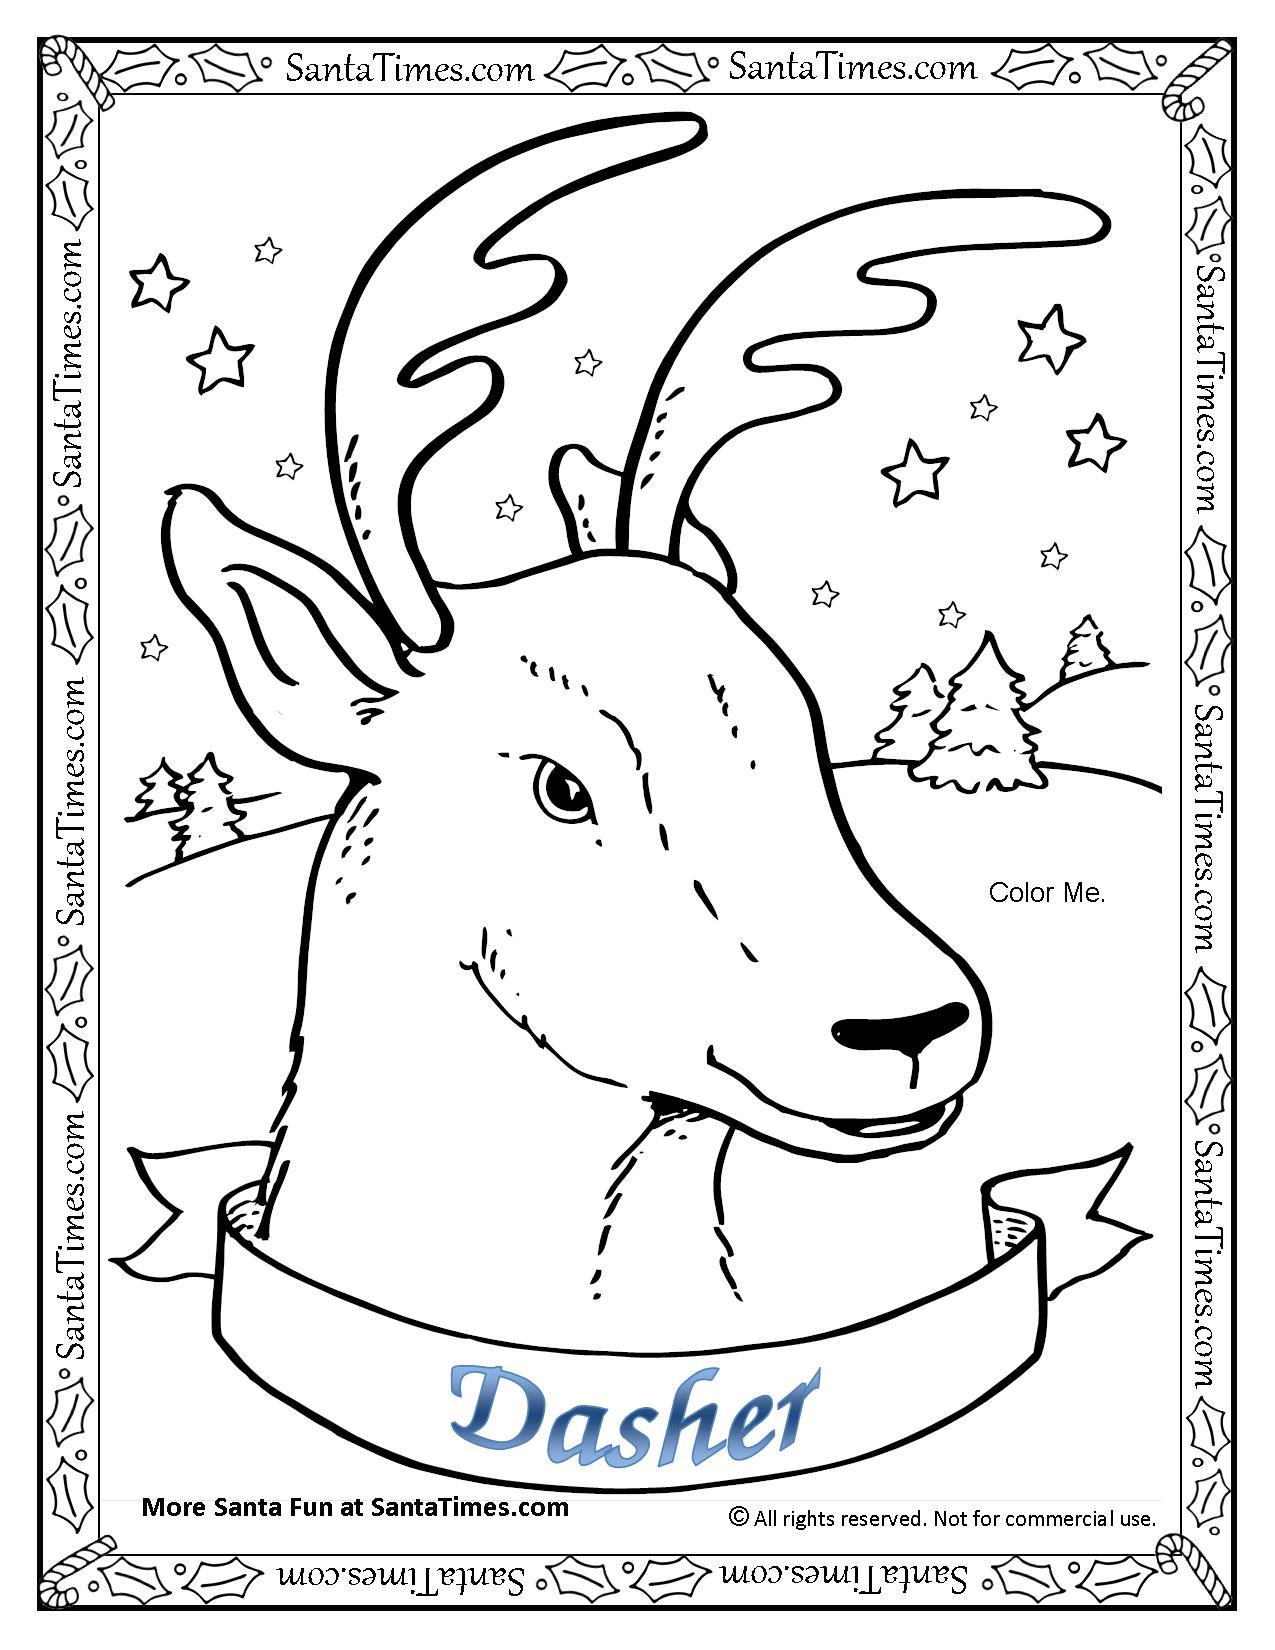 Dasher The Reindeer